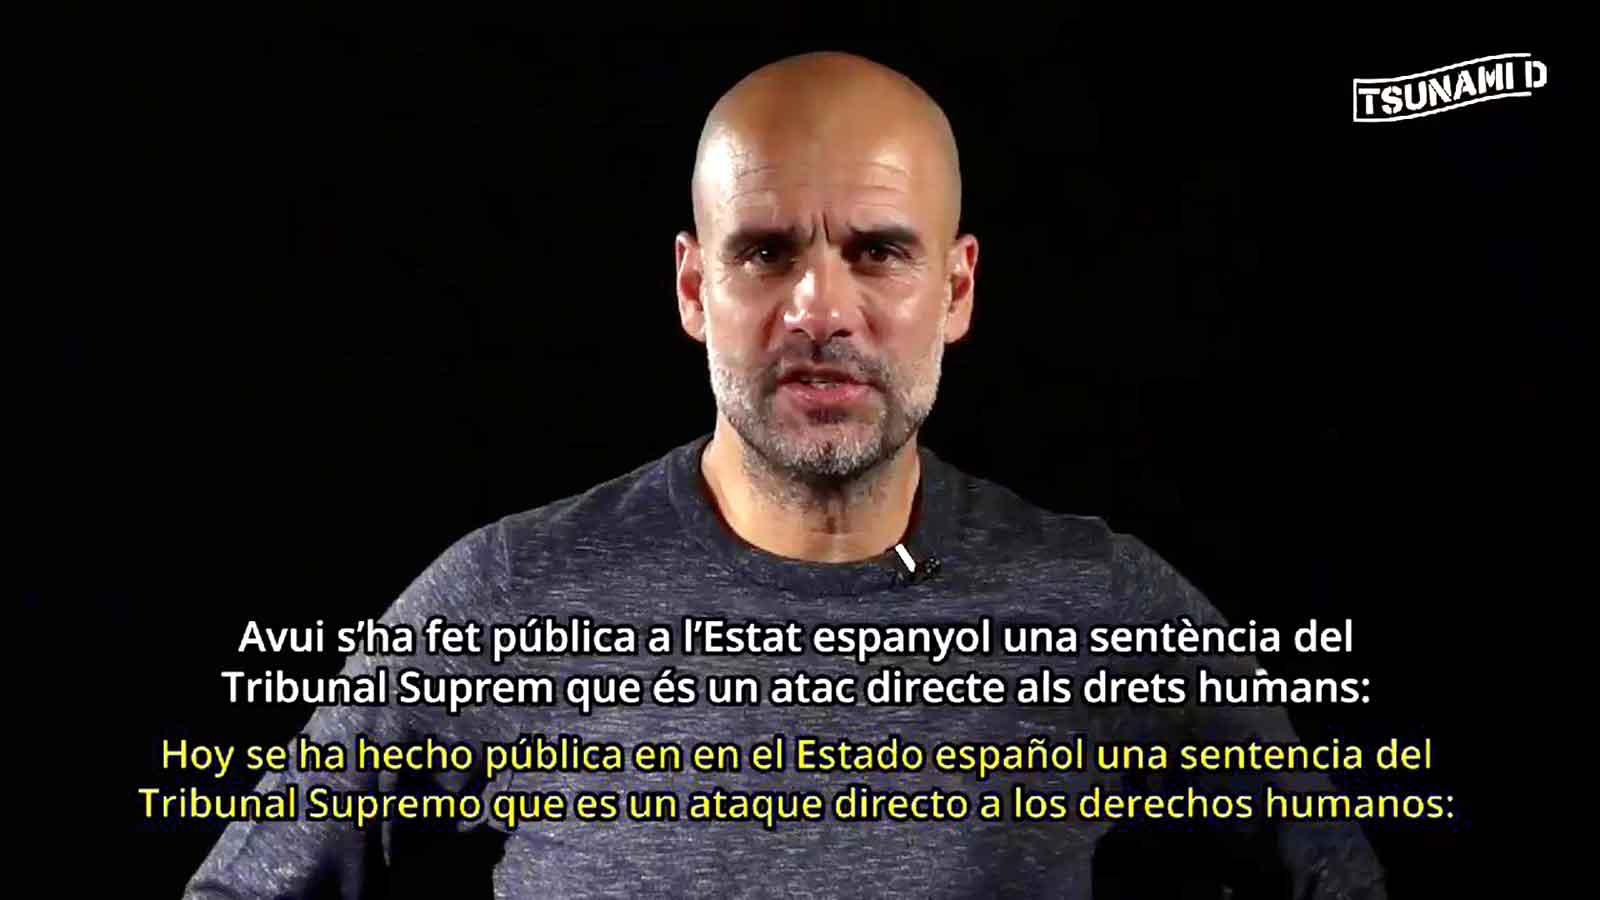 Guardiola debates the Catalan sentence